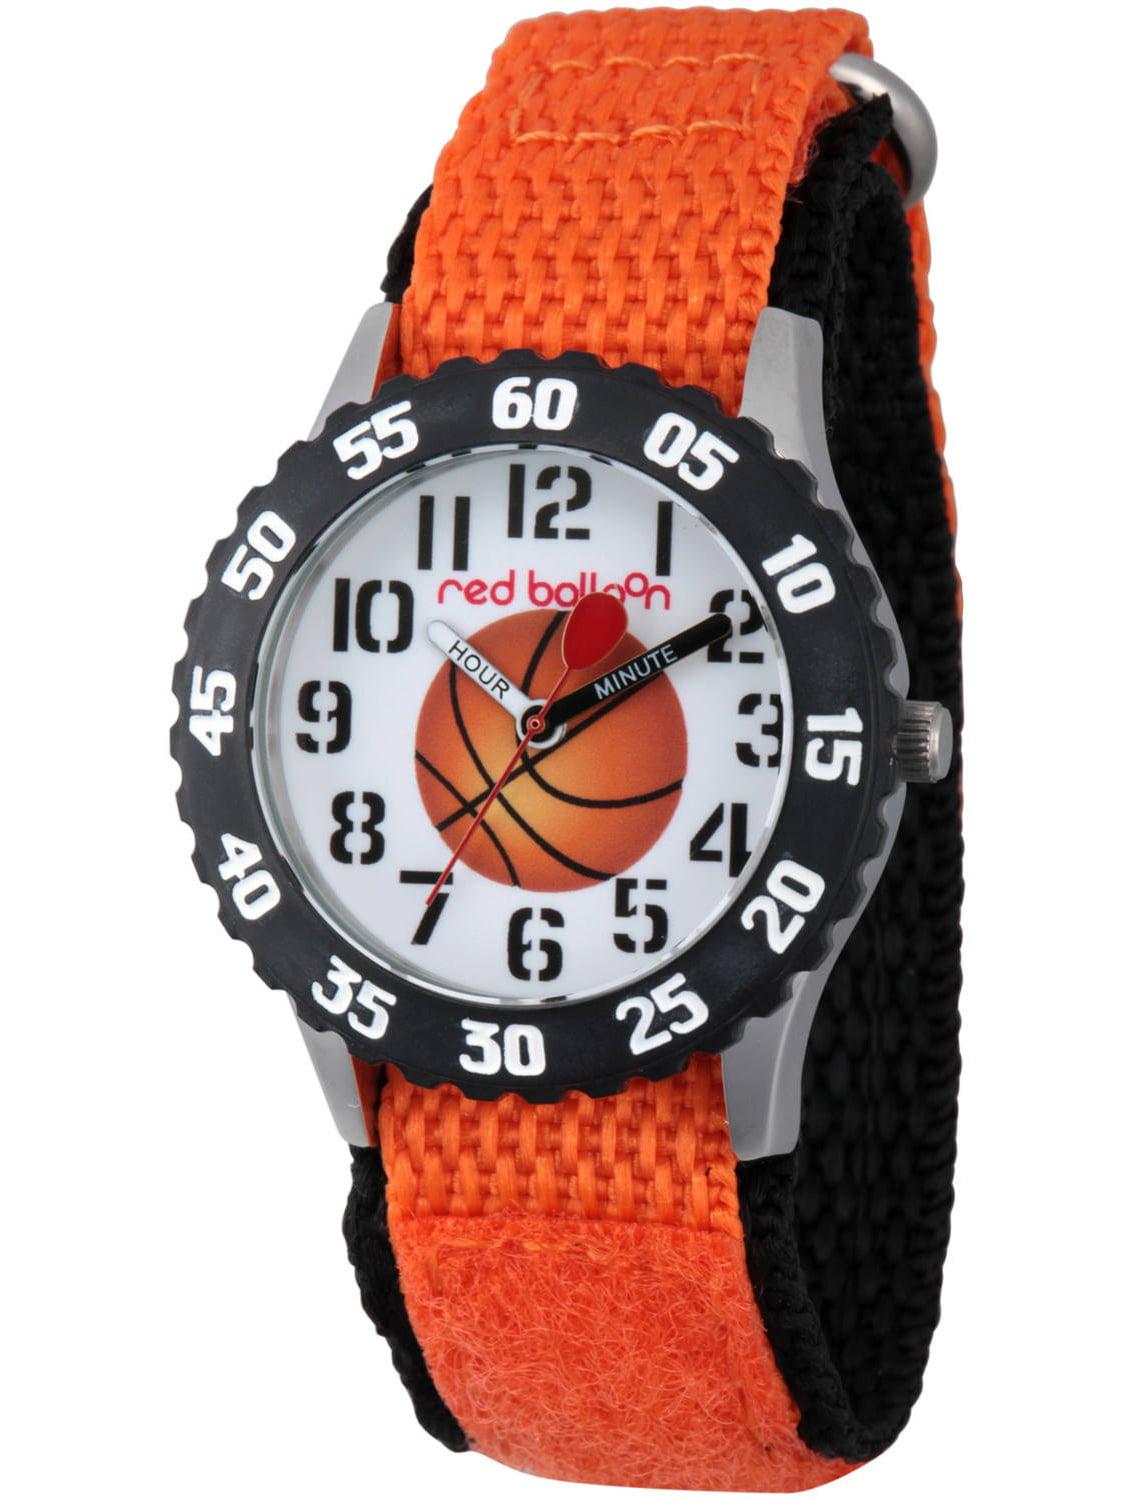 Basketball Boys' Stainless Steel Time Teacher Watch, Black Bezel, Orange Hook and Loop Nylon Strap with Black Backing